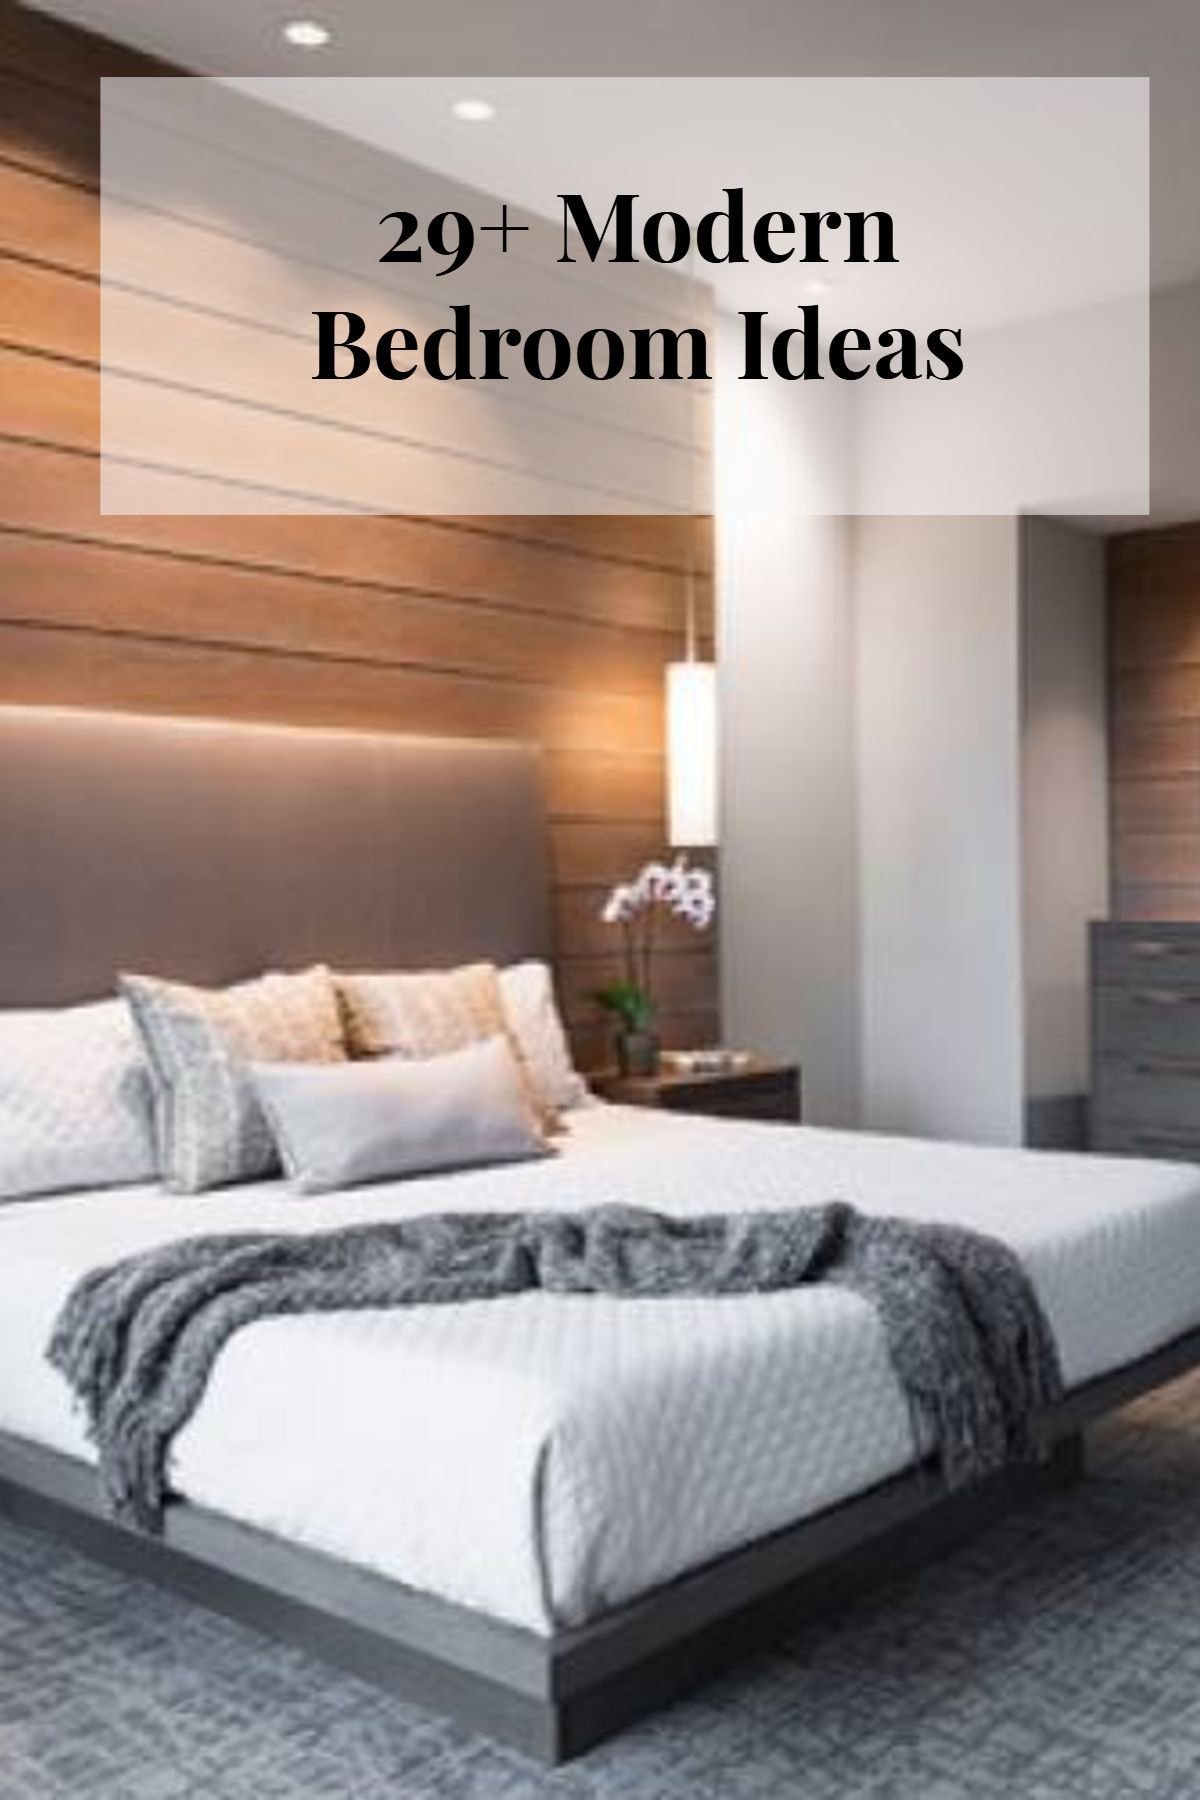 Modern Minimalist Master Bedroom 2021 in 2020 | Minimalist ...